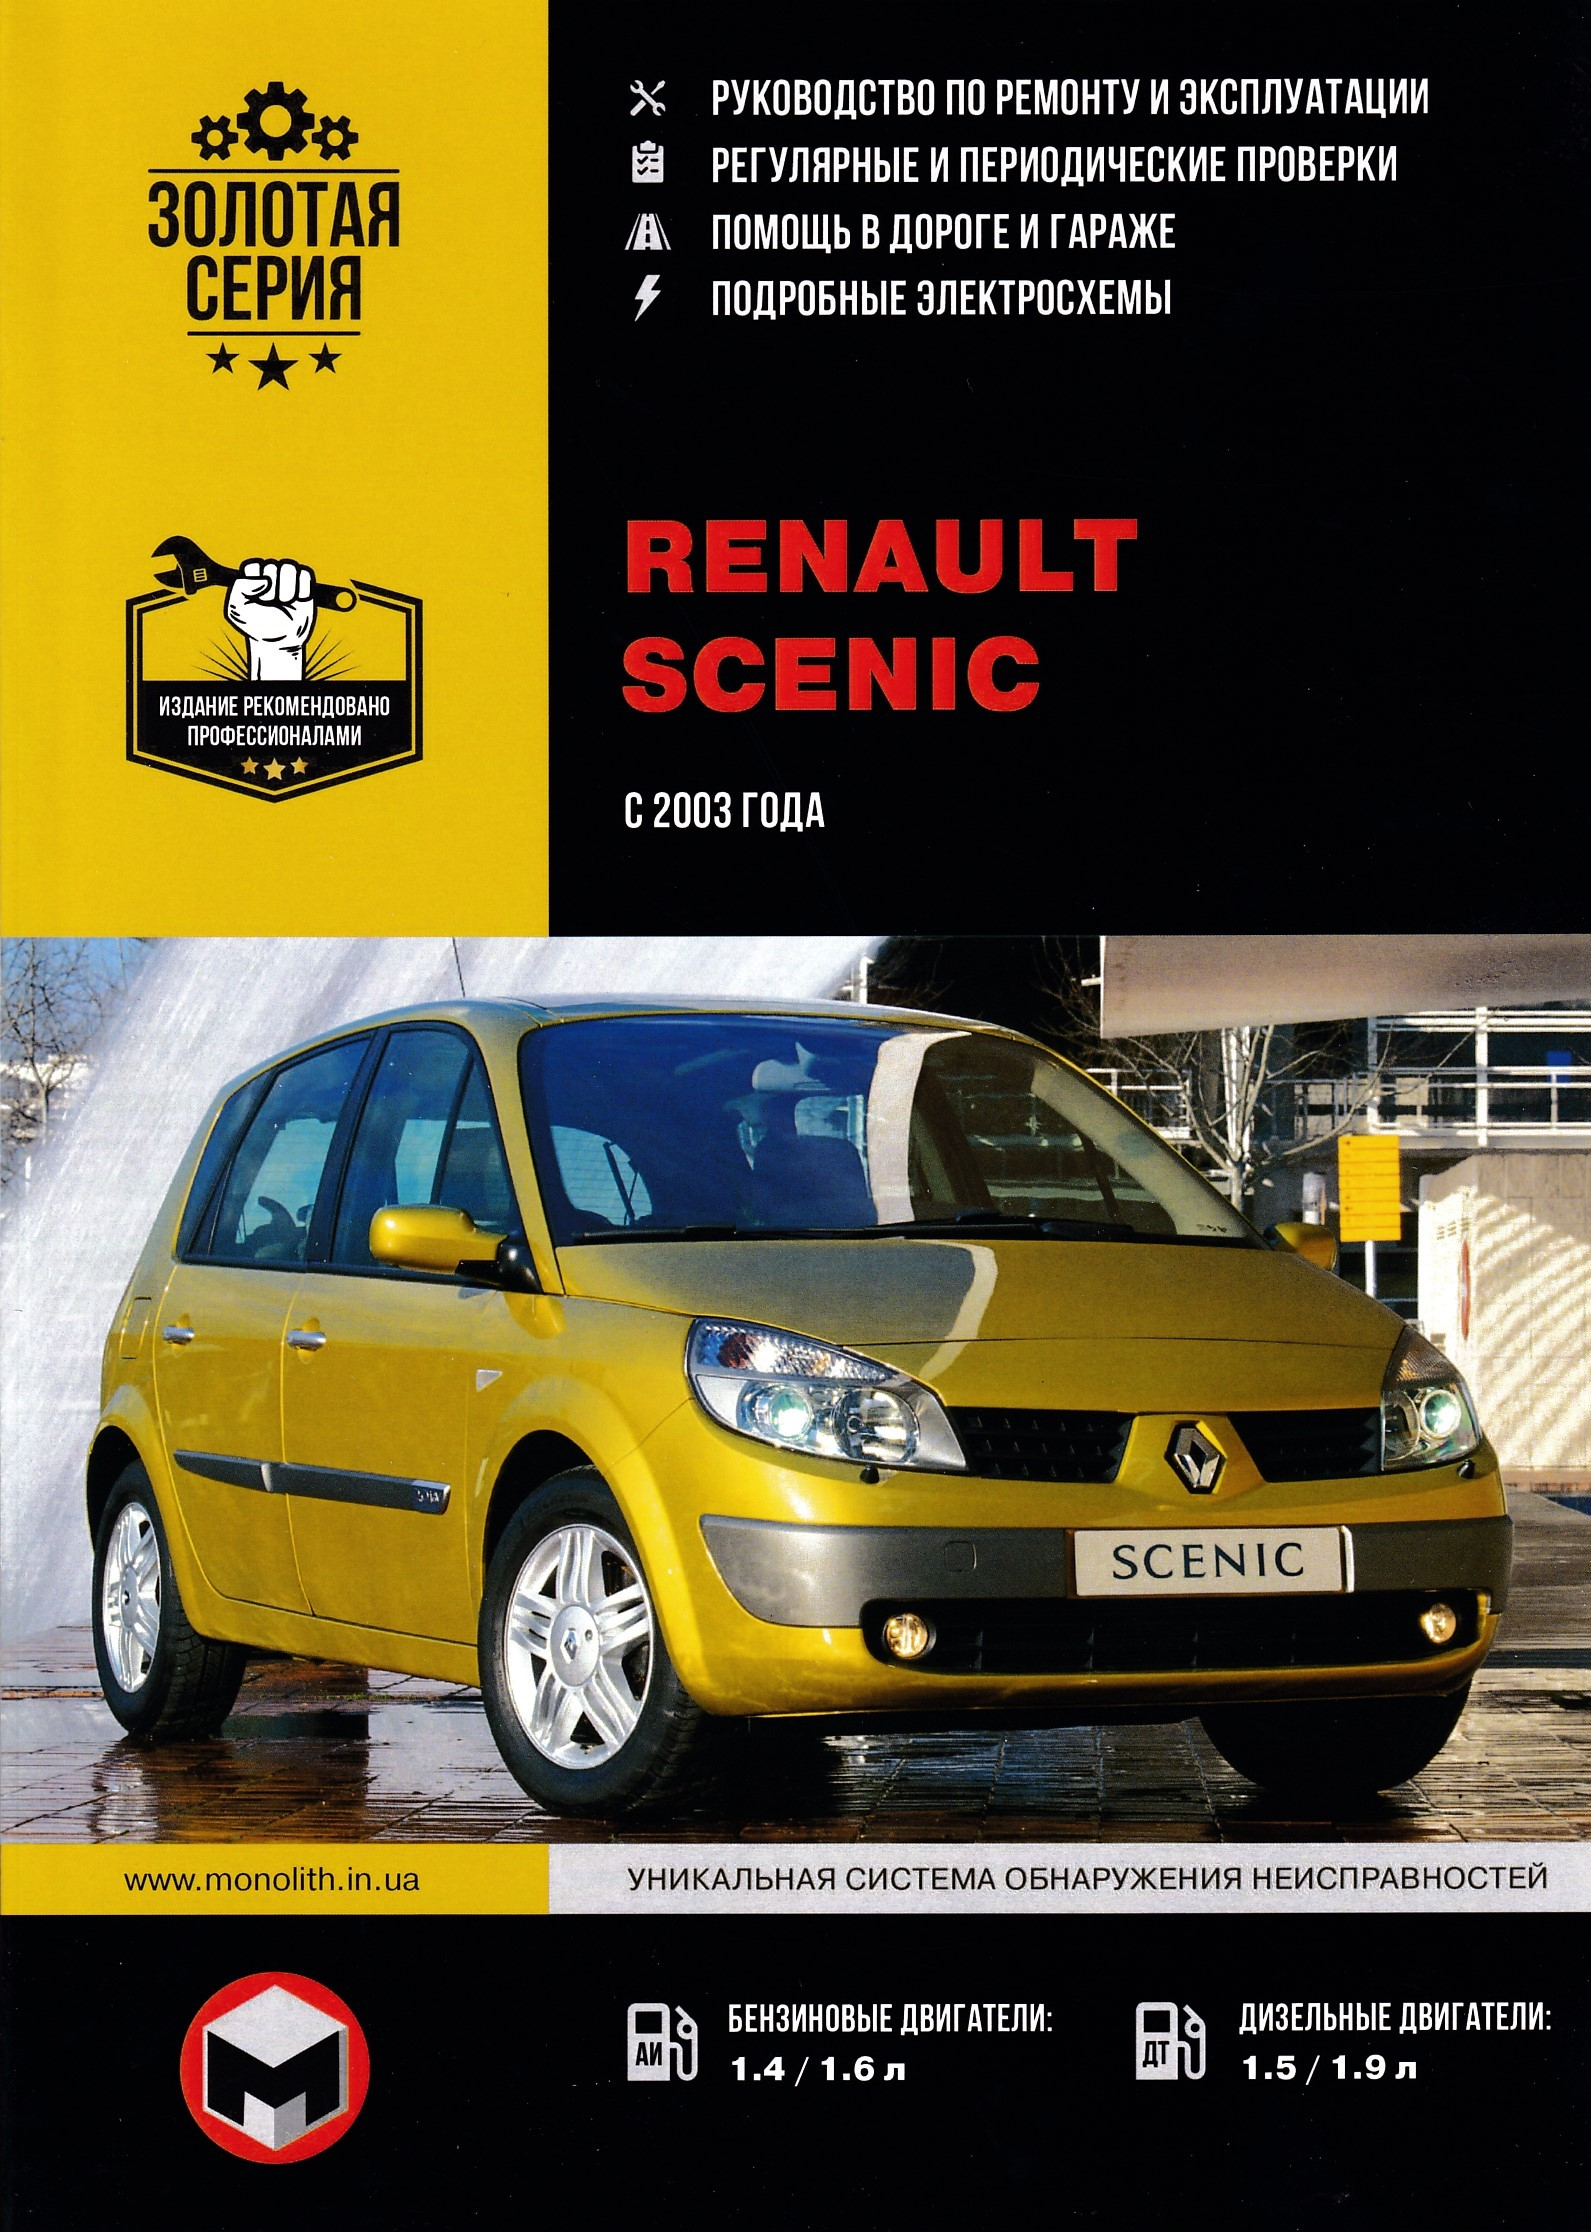 Renault scenic 2007 руководство по эксплуатации